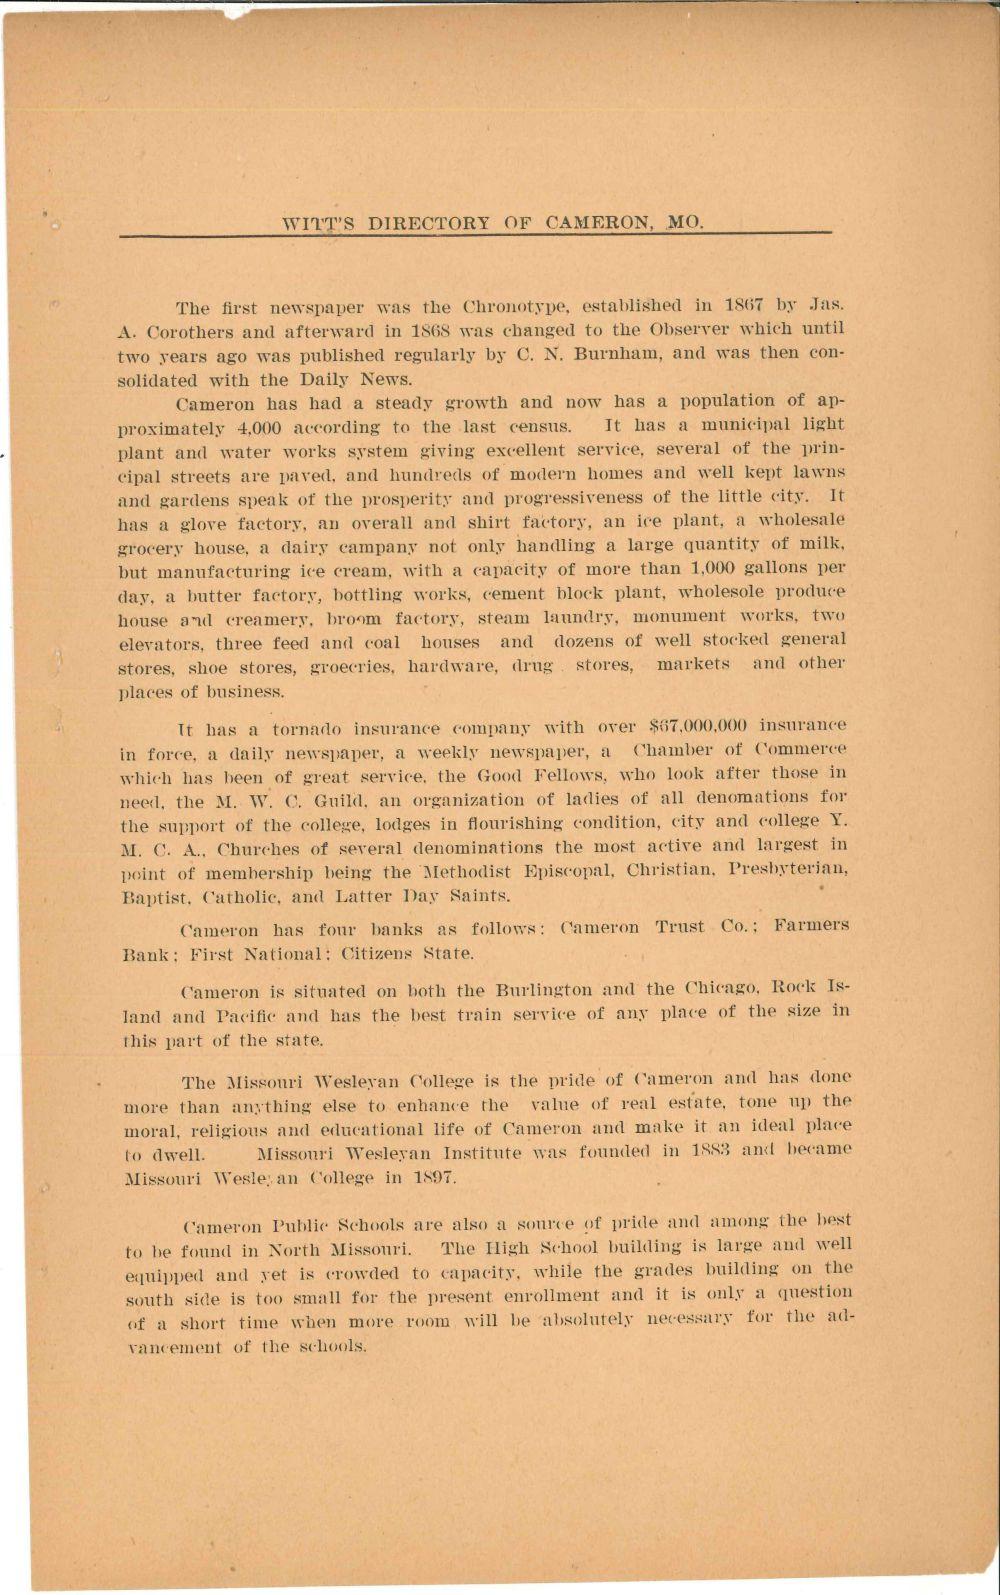 1923 Cameron Directory - Cameron Missouri History